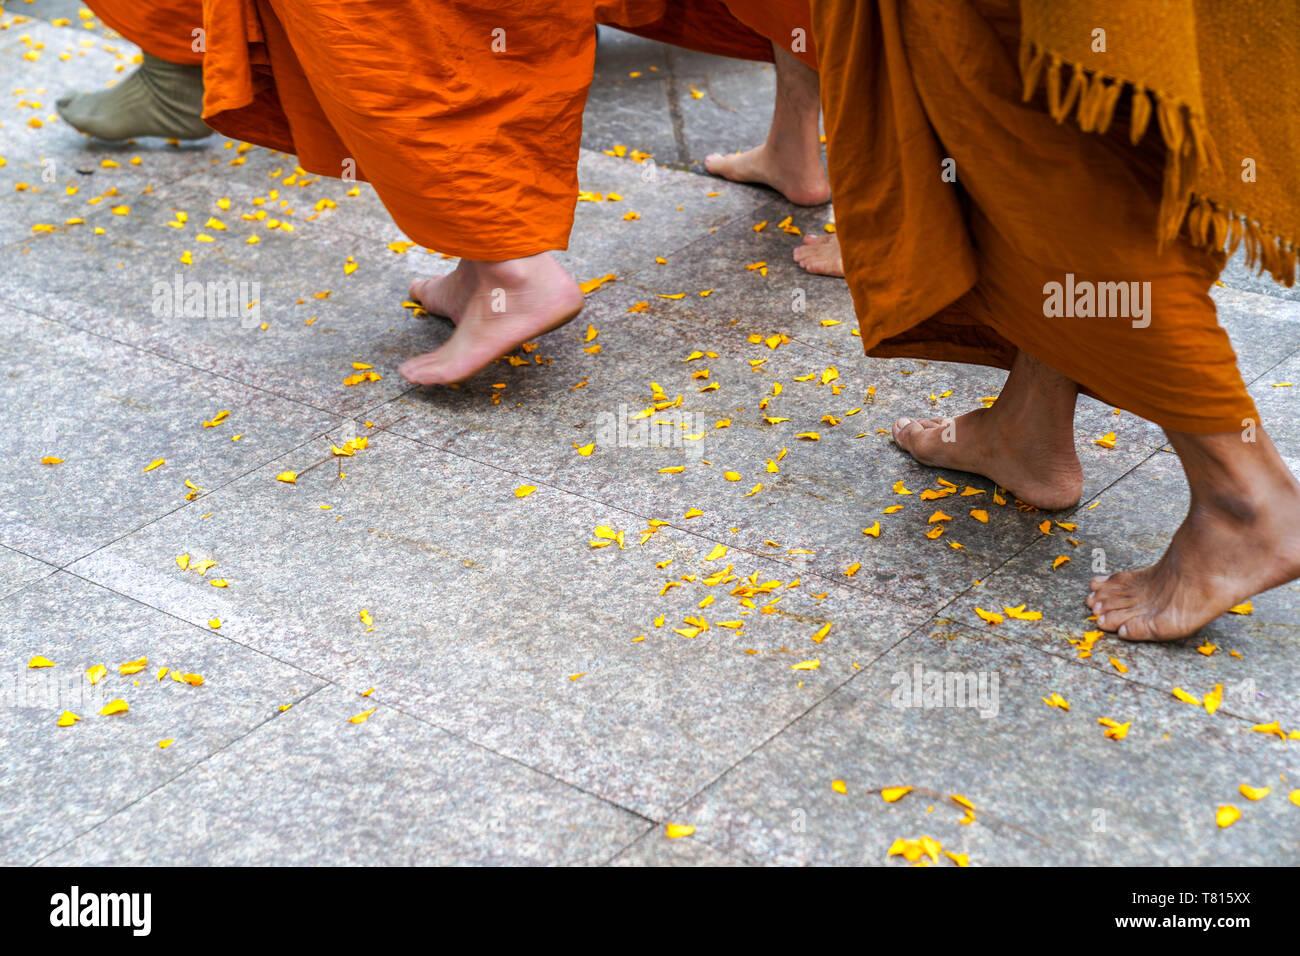 Step Of Monks Feet Walk On Terrazzo Floor With Yellow